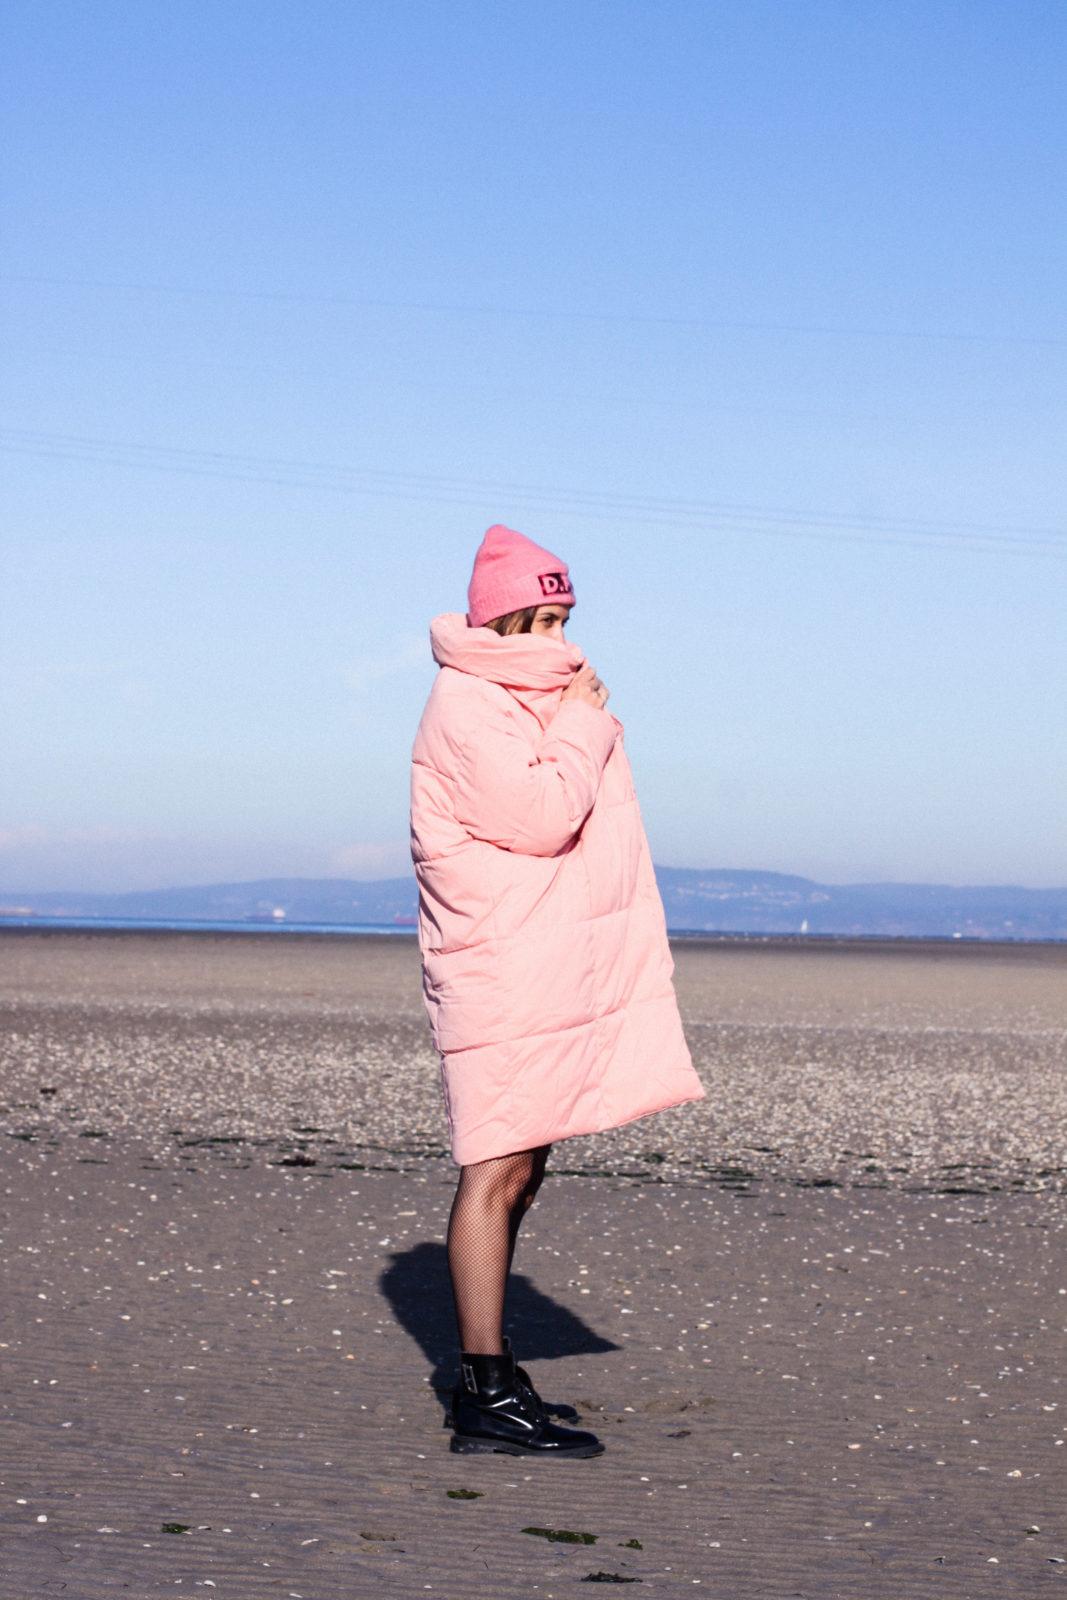 retailmenot-cupones-descuentos-asos-plumifero_rosa-monki-puffer_coat-gorro-beanie-medias_de_rejilla-look-outfit-tendencias-fall-2016-street_style-donkeycool-11